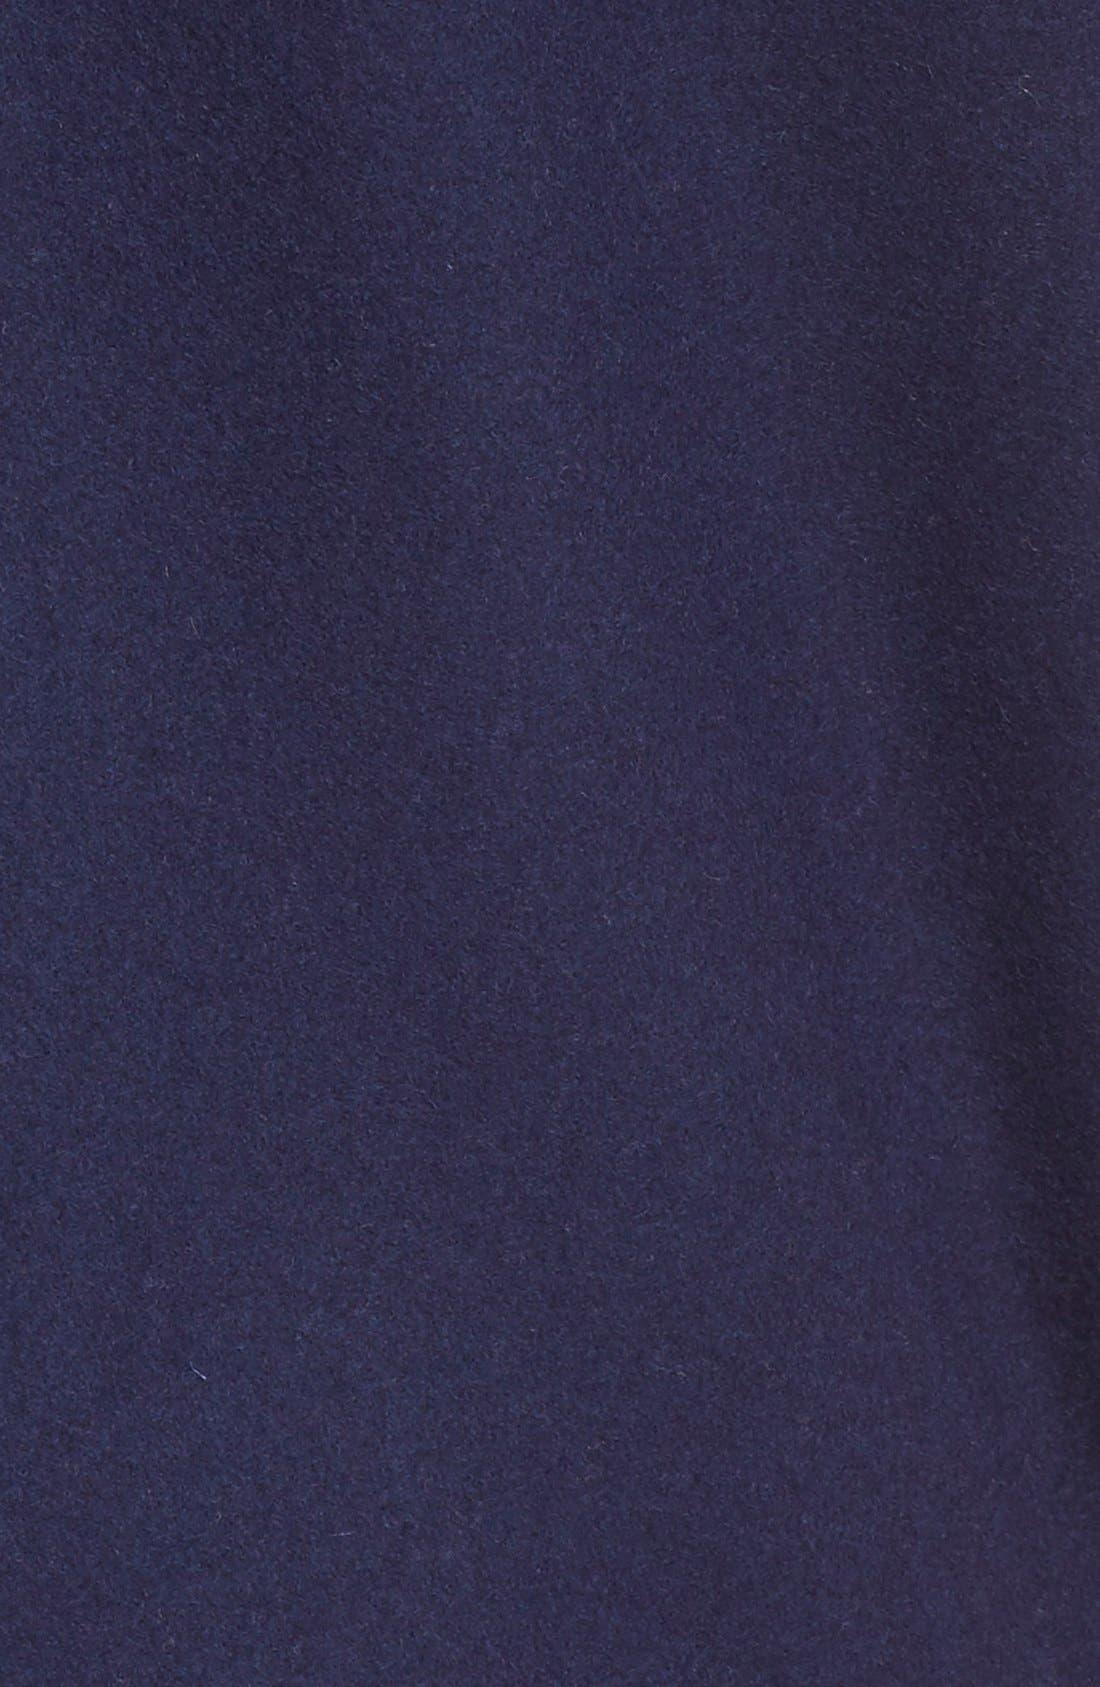 Alternate Image 3  - MARC JACOBS Shrunken Varsity Jacket